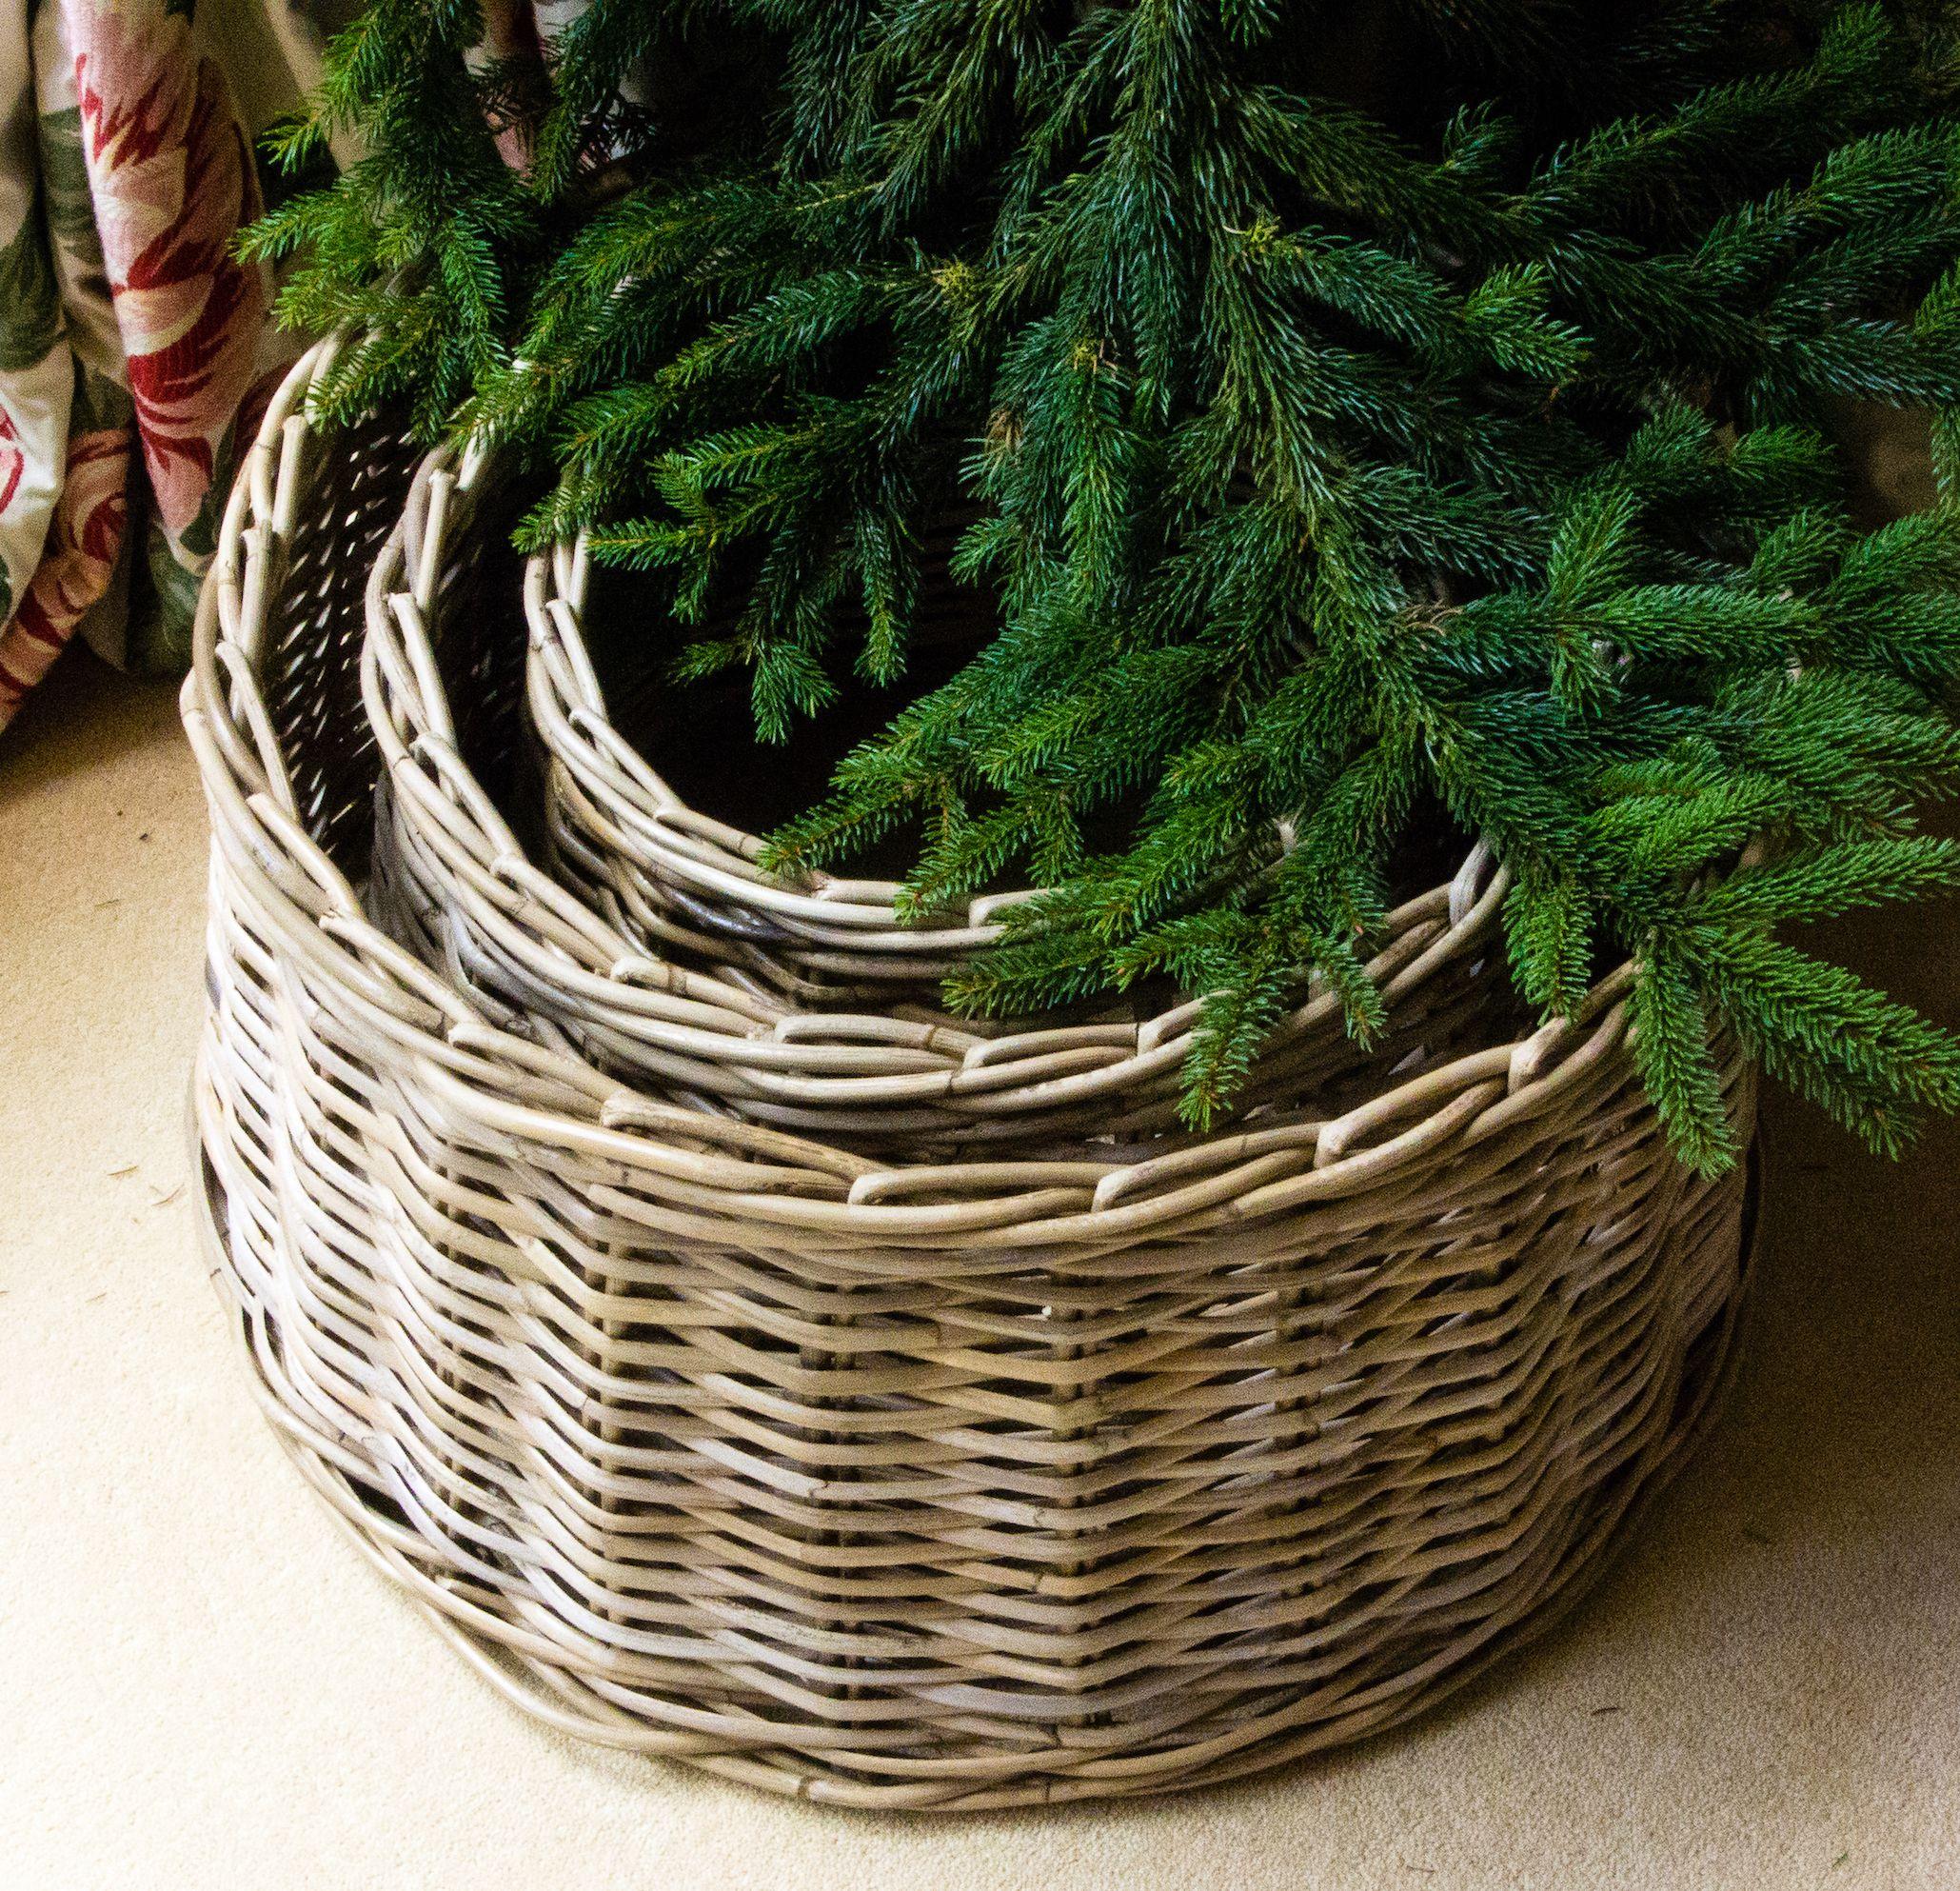 Best Christmas Tree Skirts Wicker Christmas Tree Skirts Gold